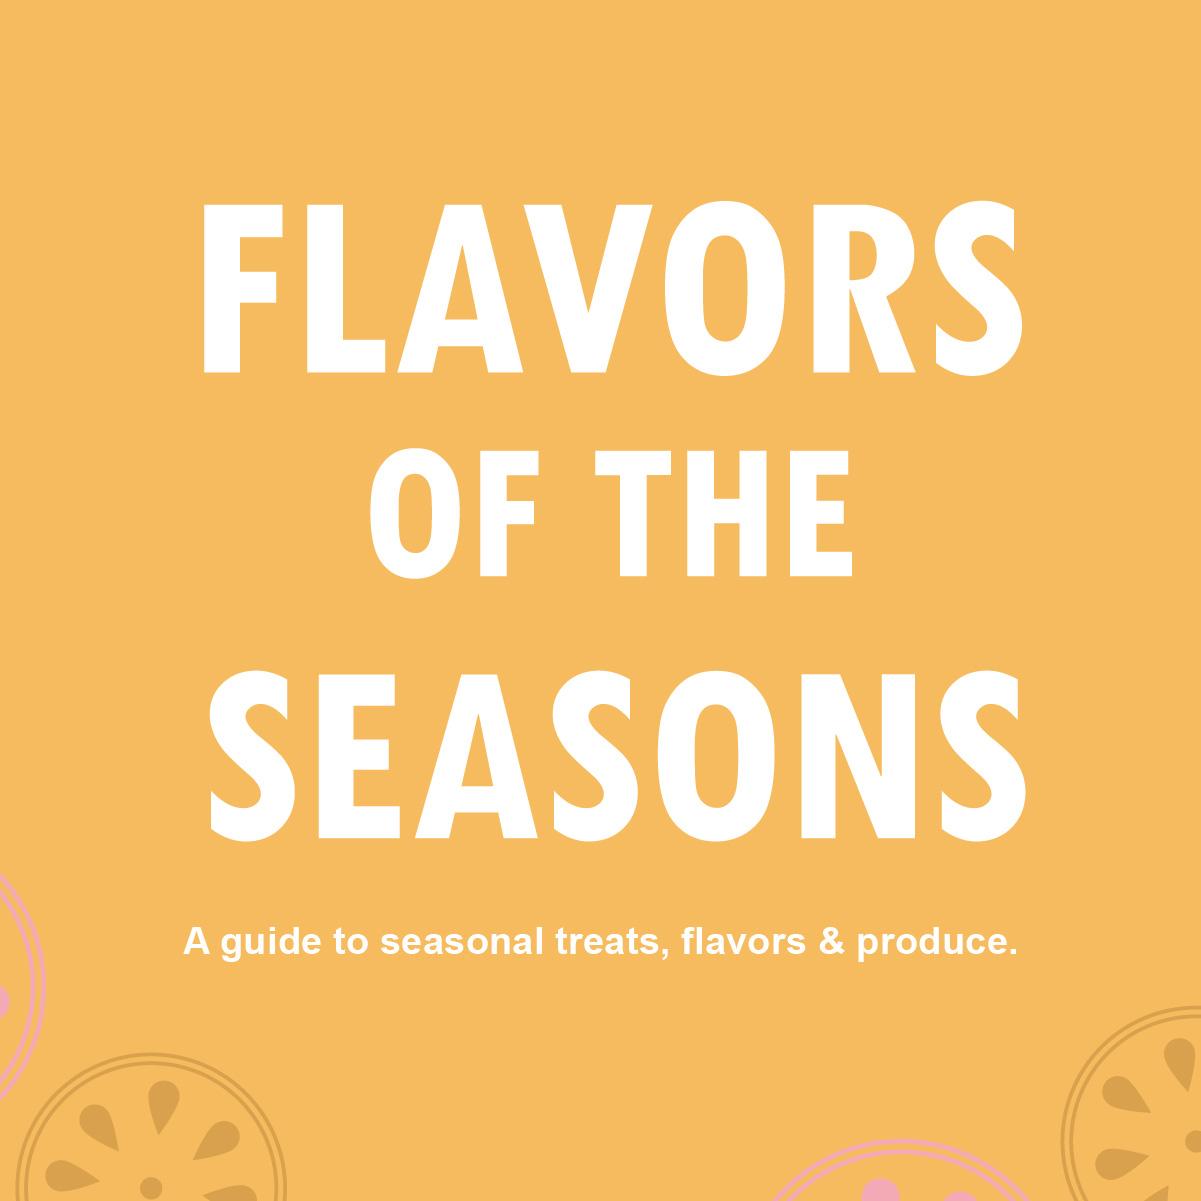 flavor-guide